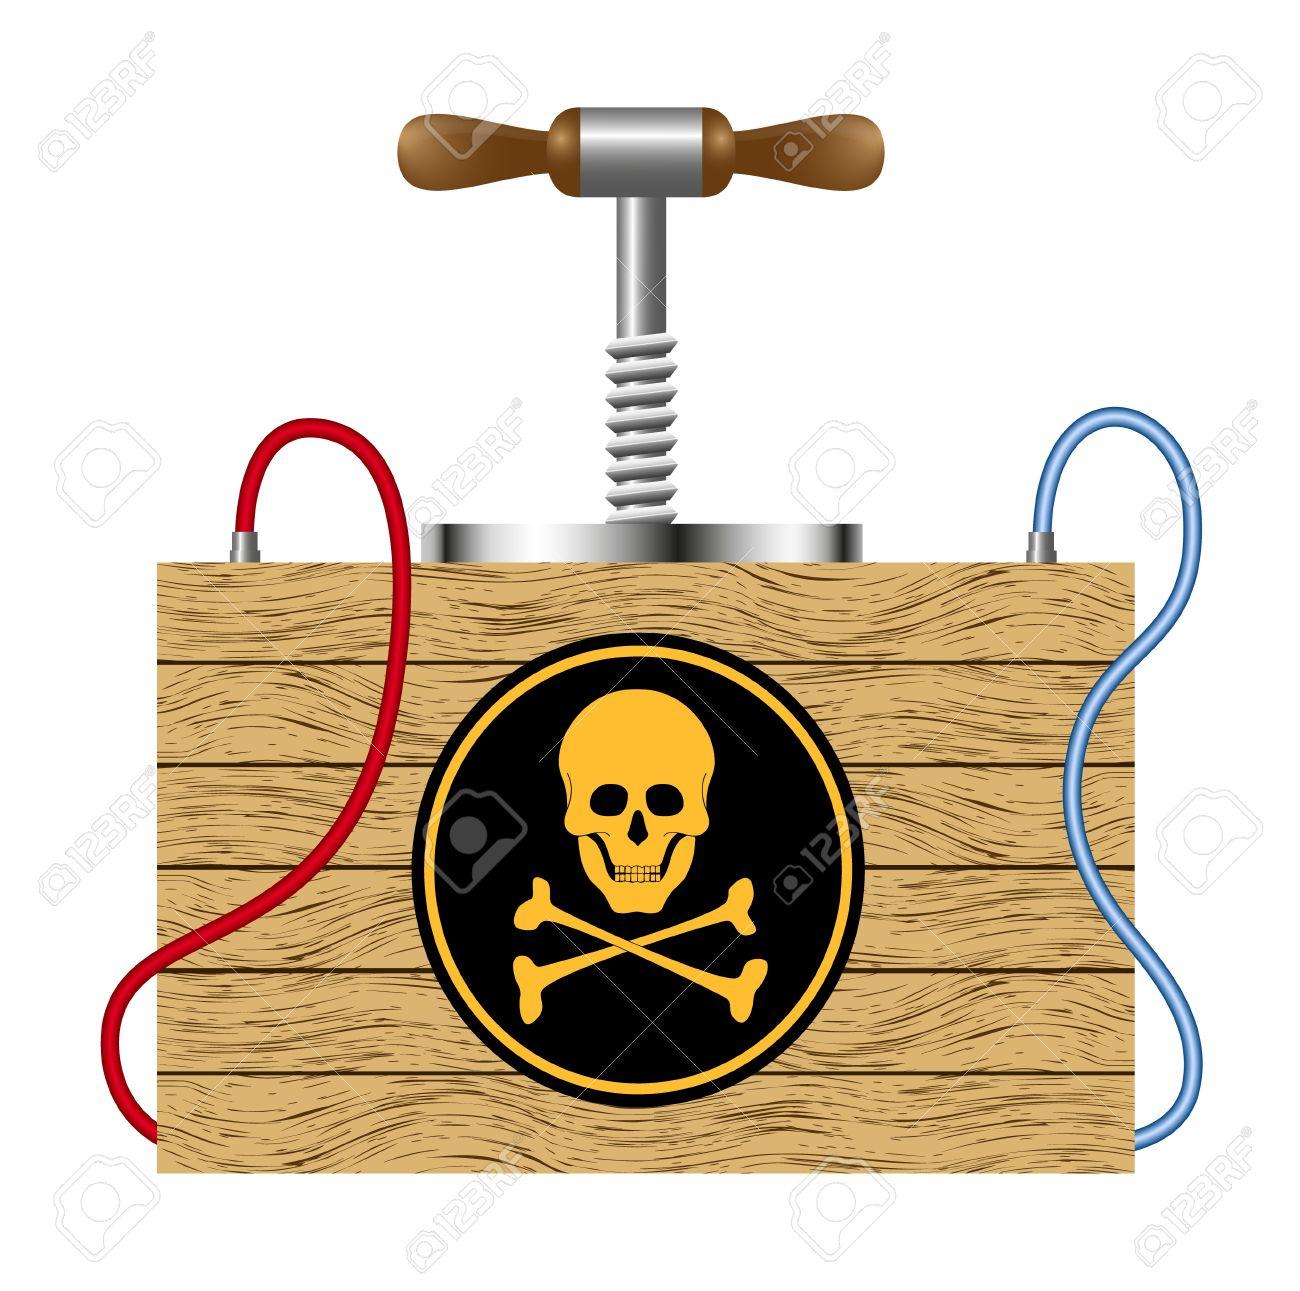 Bomb (detonation Cabinet) With Danger Sign (skull Symbol) Royalty.